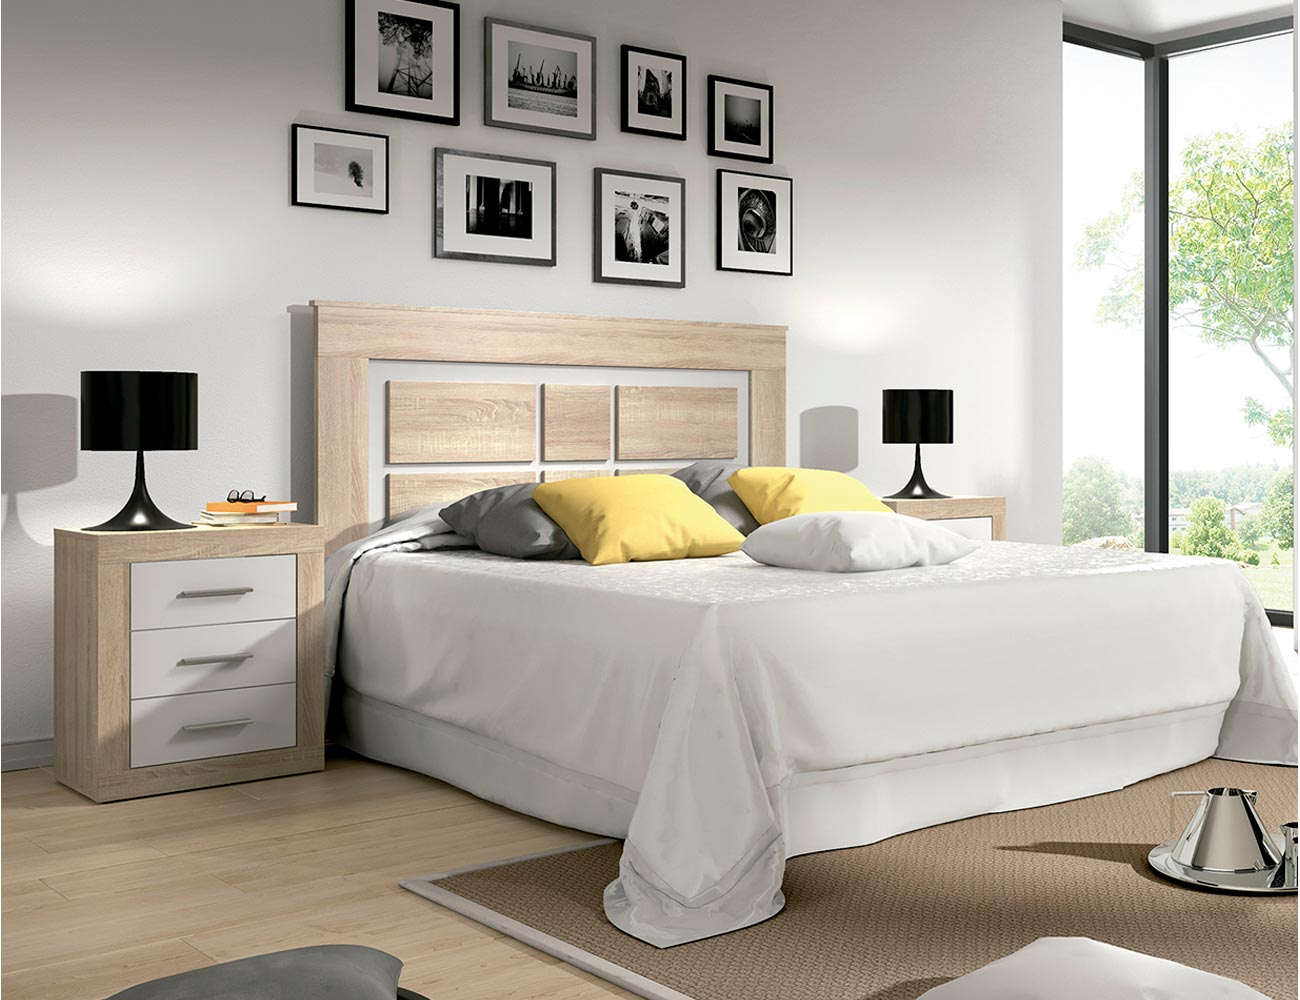 Dormitorio matrimonio estilo moderno cambrian blanco for Dormitorio matrimonio moderno